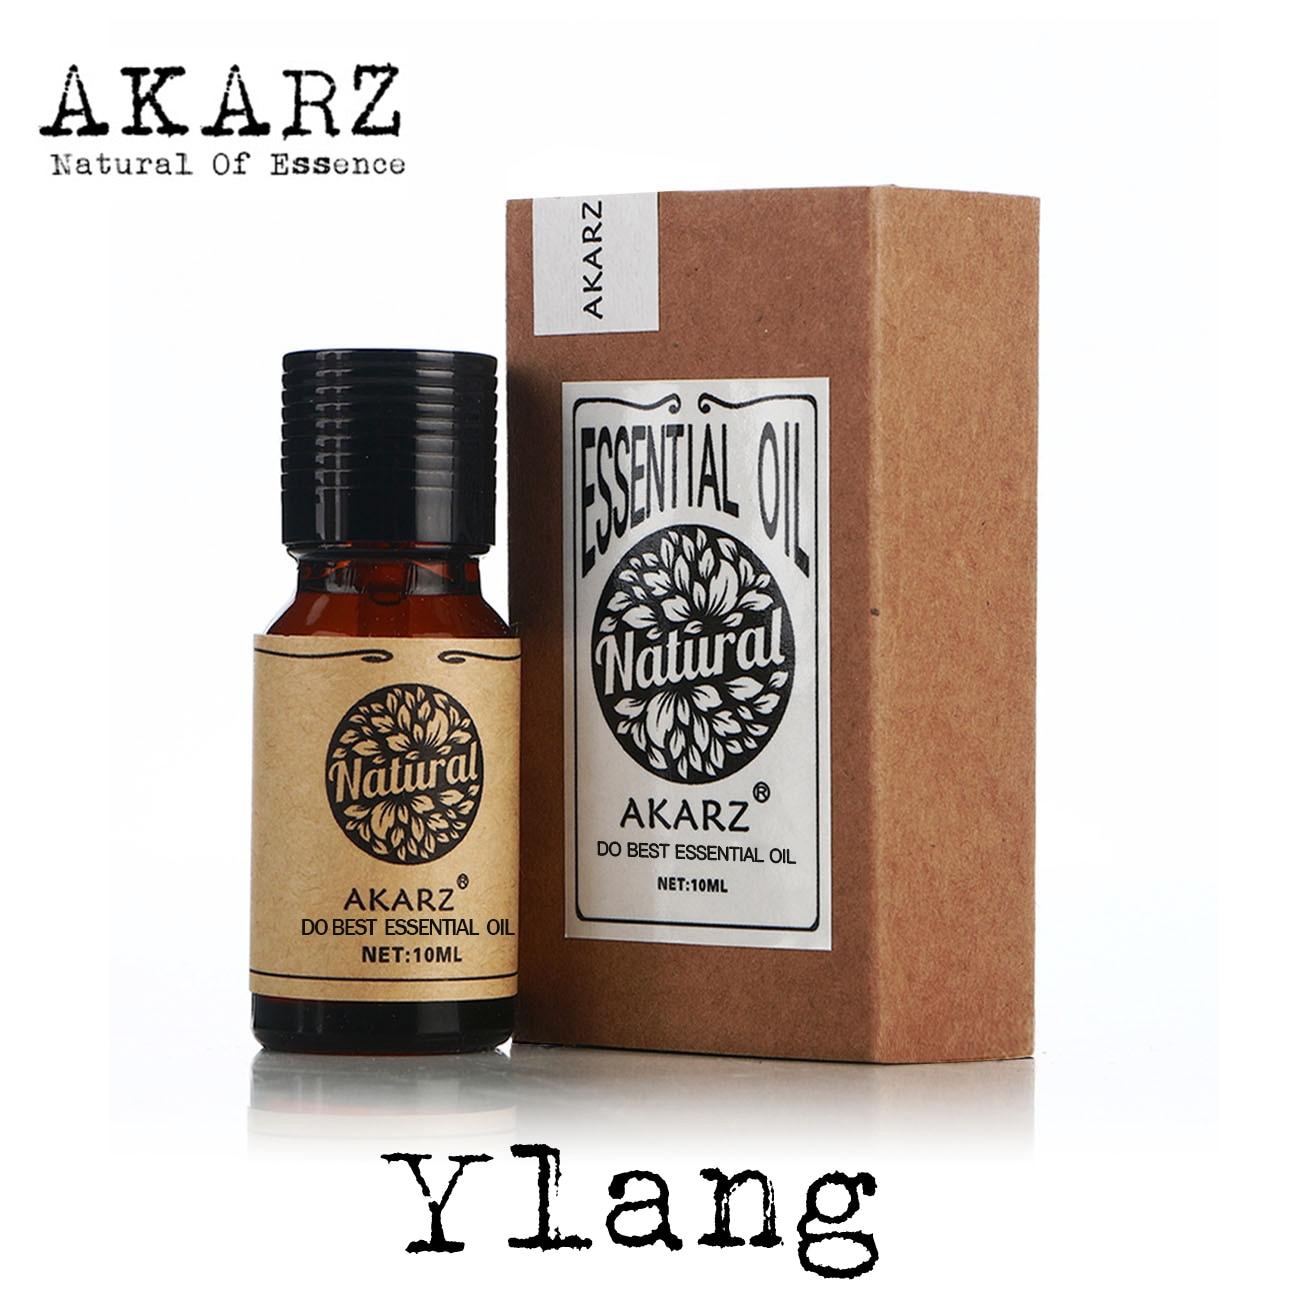 AKARZ מפורסם מותג משלוח חינם טבעי ארומתרפיה חיוני שיקוי שמן אפקט להירגע טיפוח עור ילנג שמן